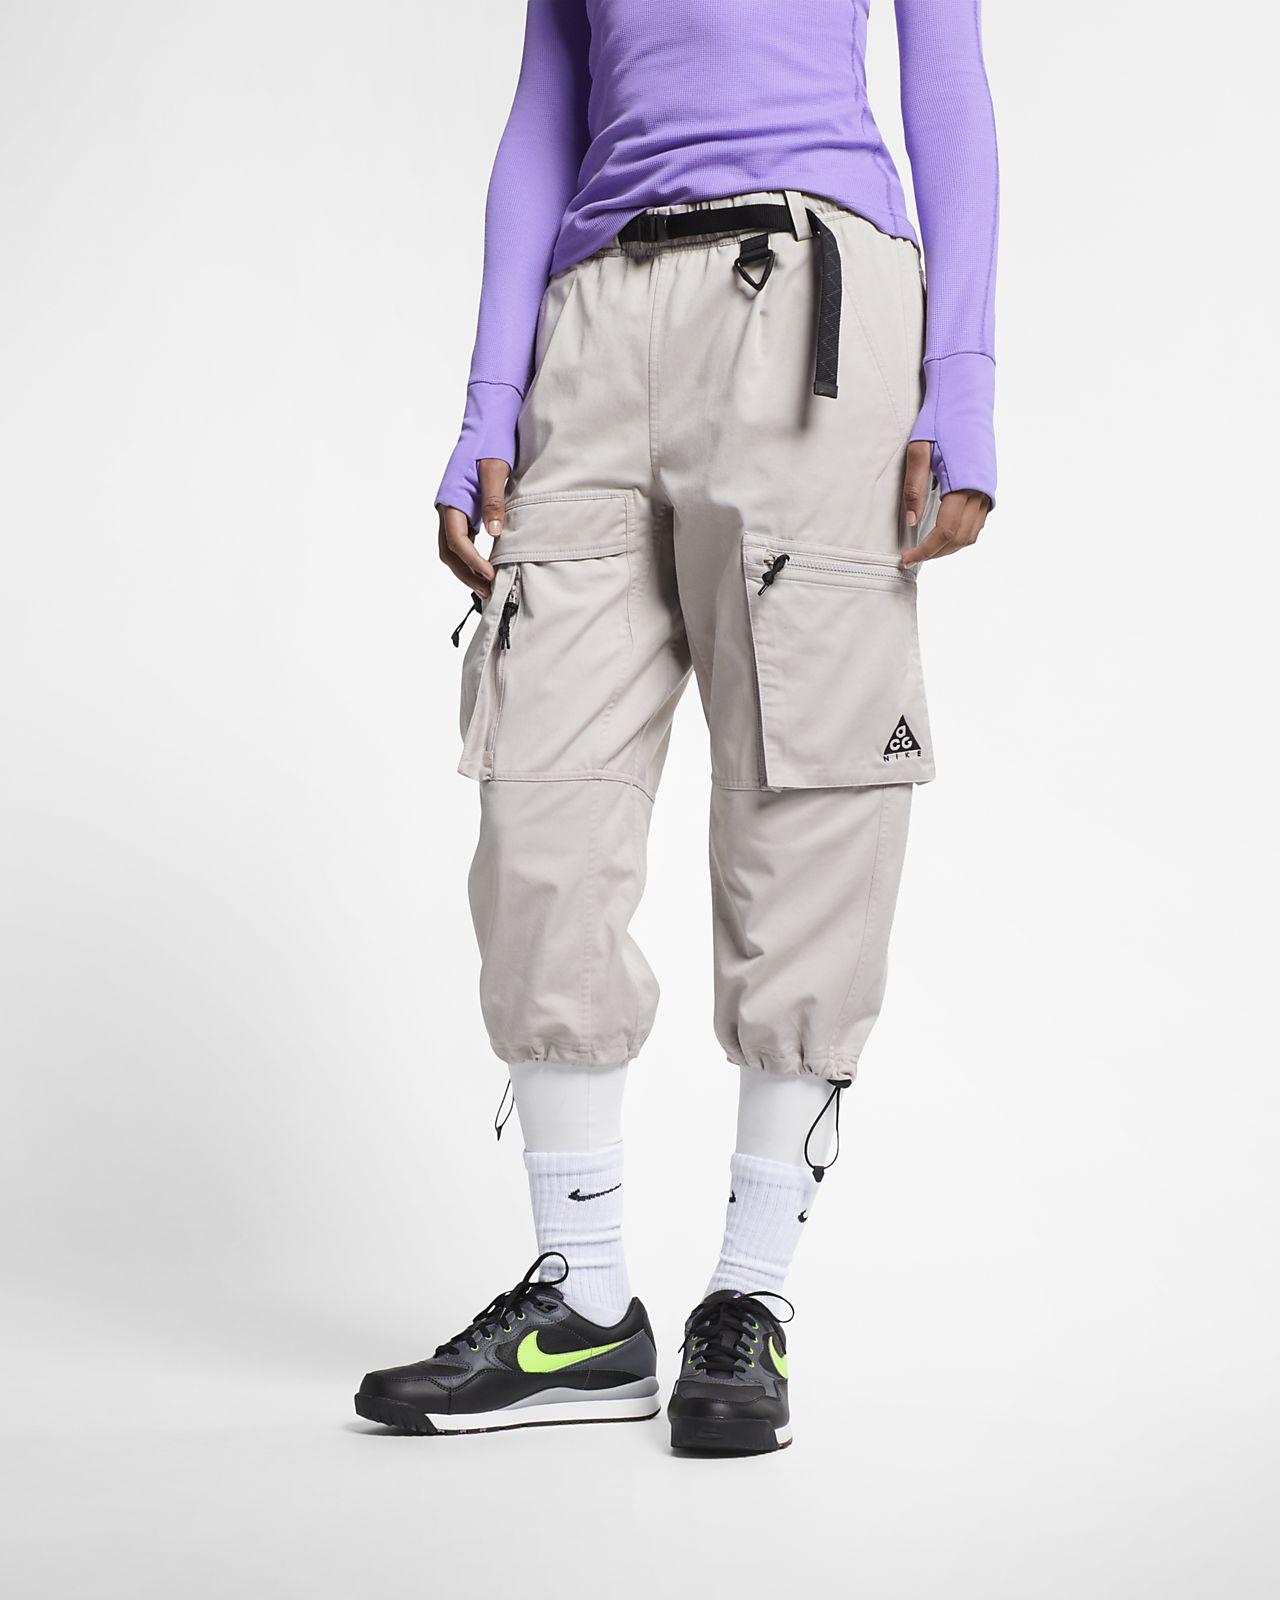 Femme Pour Nike Acg Pantalon Pantalon rBWExQdCoe